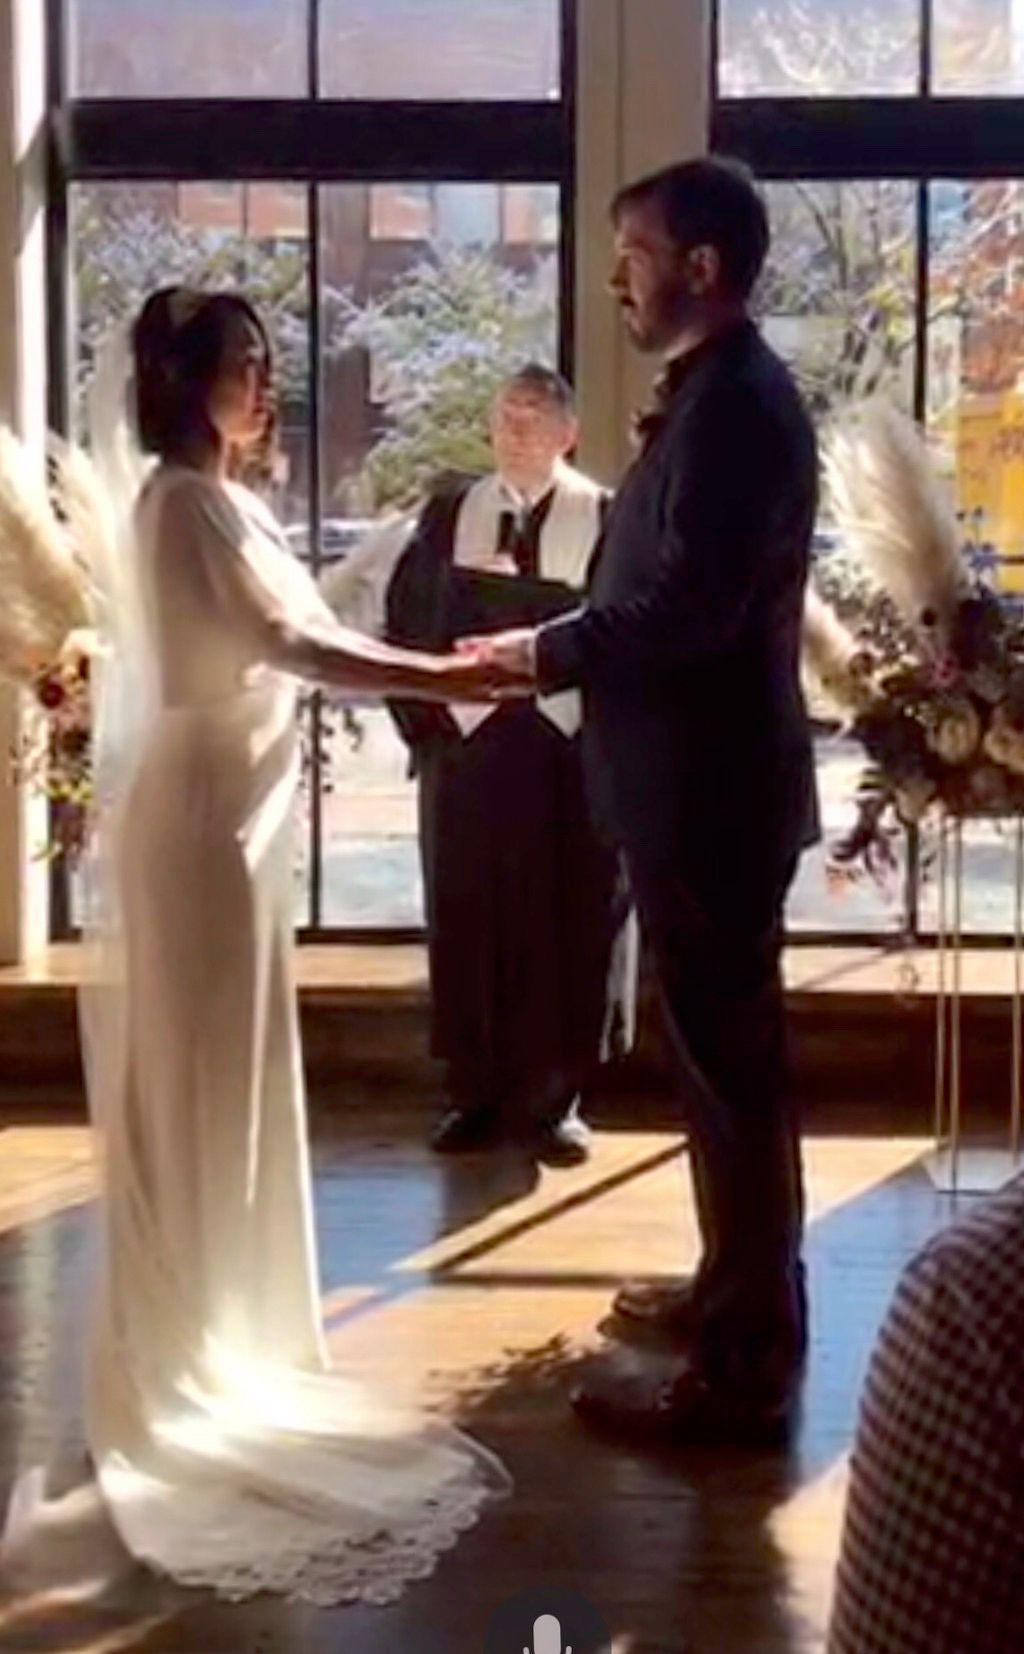 Wedding Officiant - Boston 2020